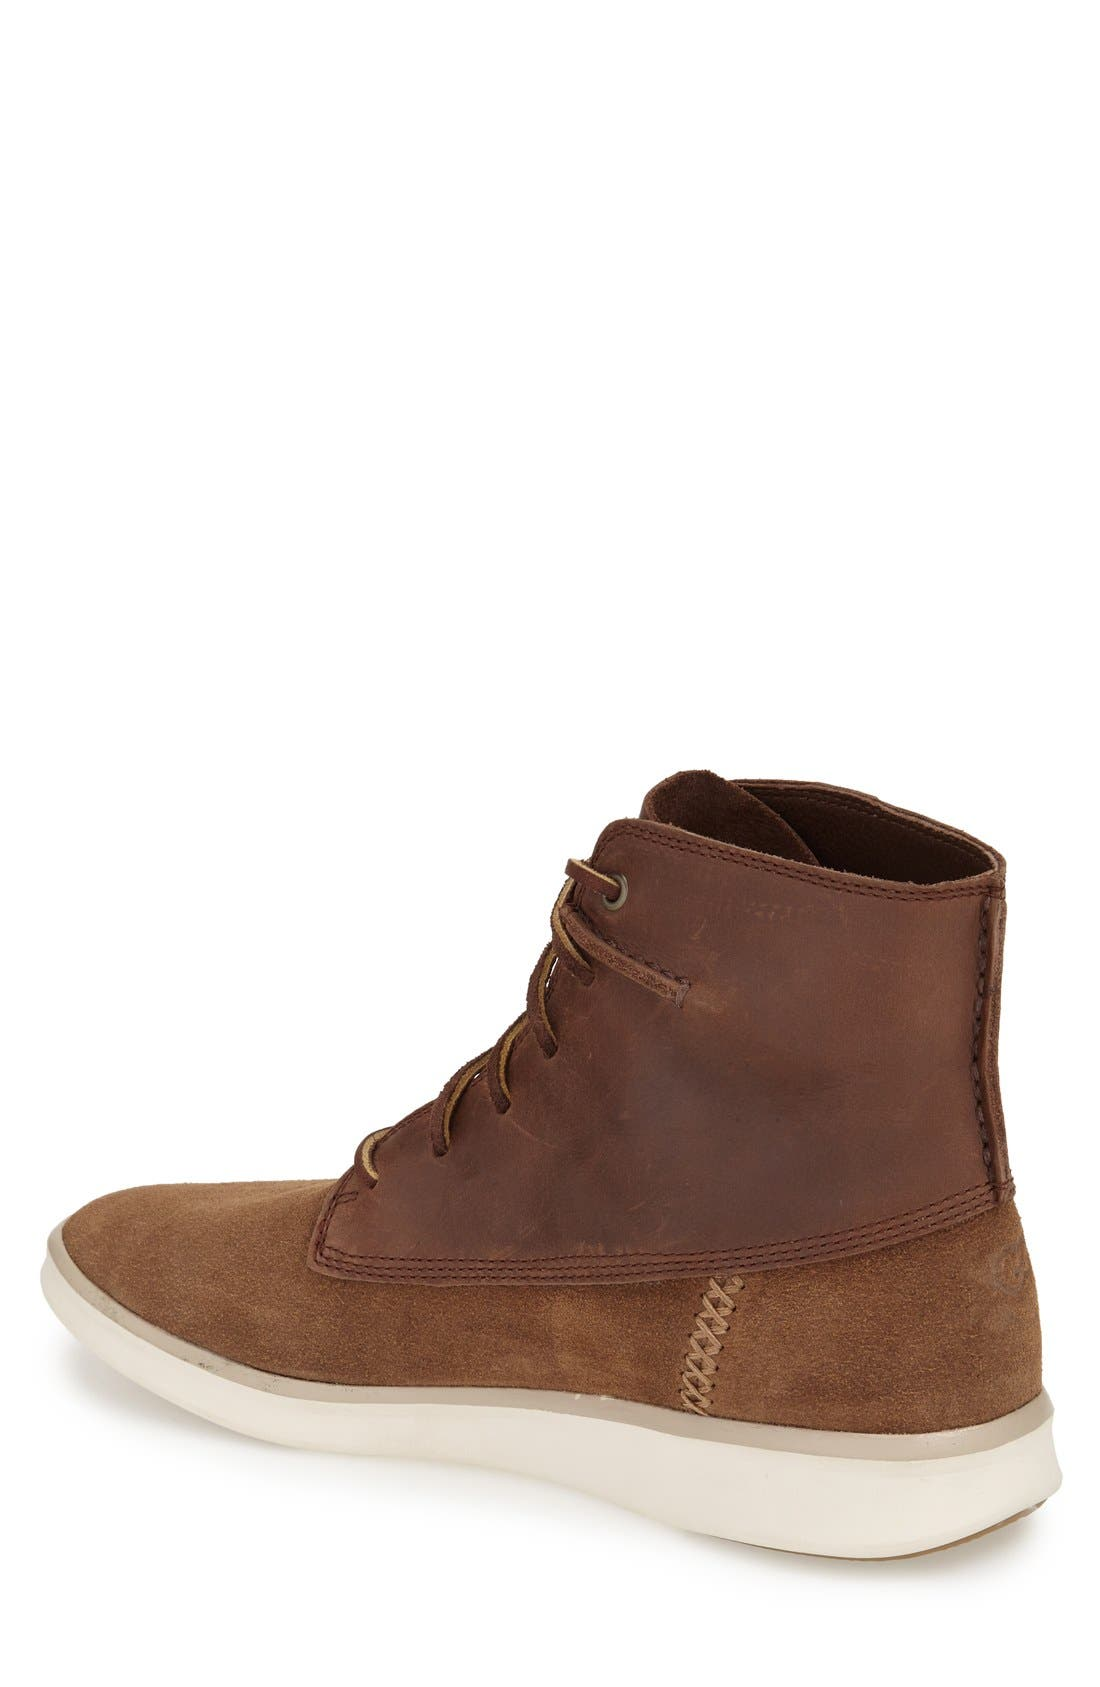 'Lamont' High Top Sneaker,                             Alternate thumbnail 2, color,